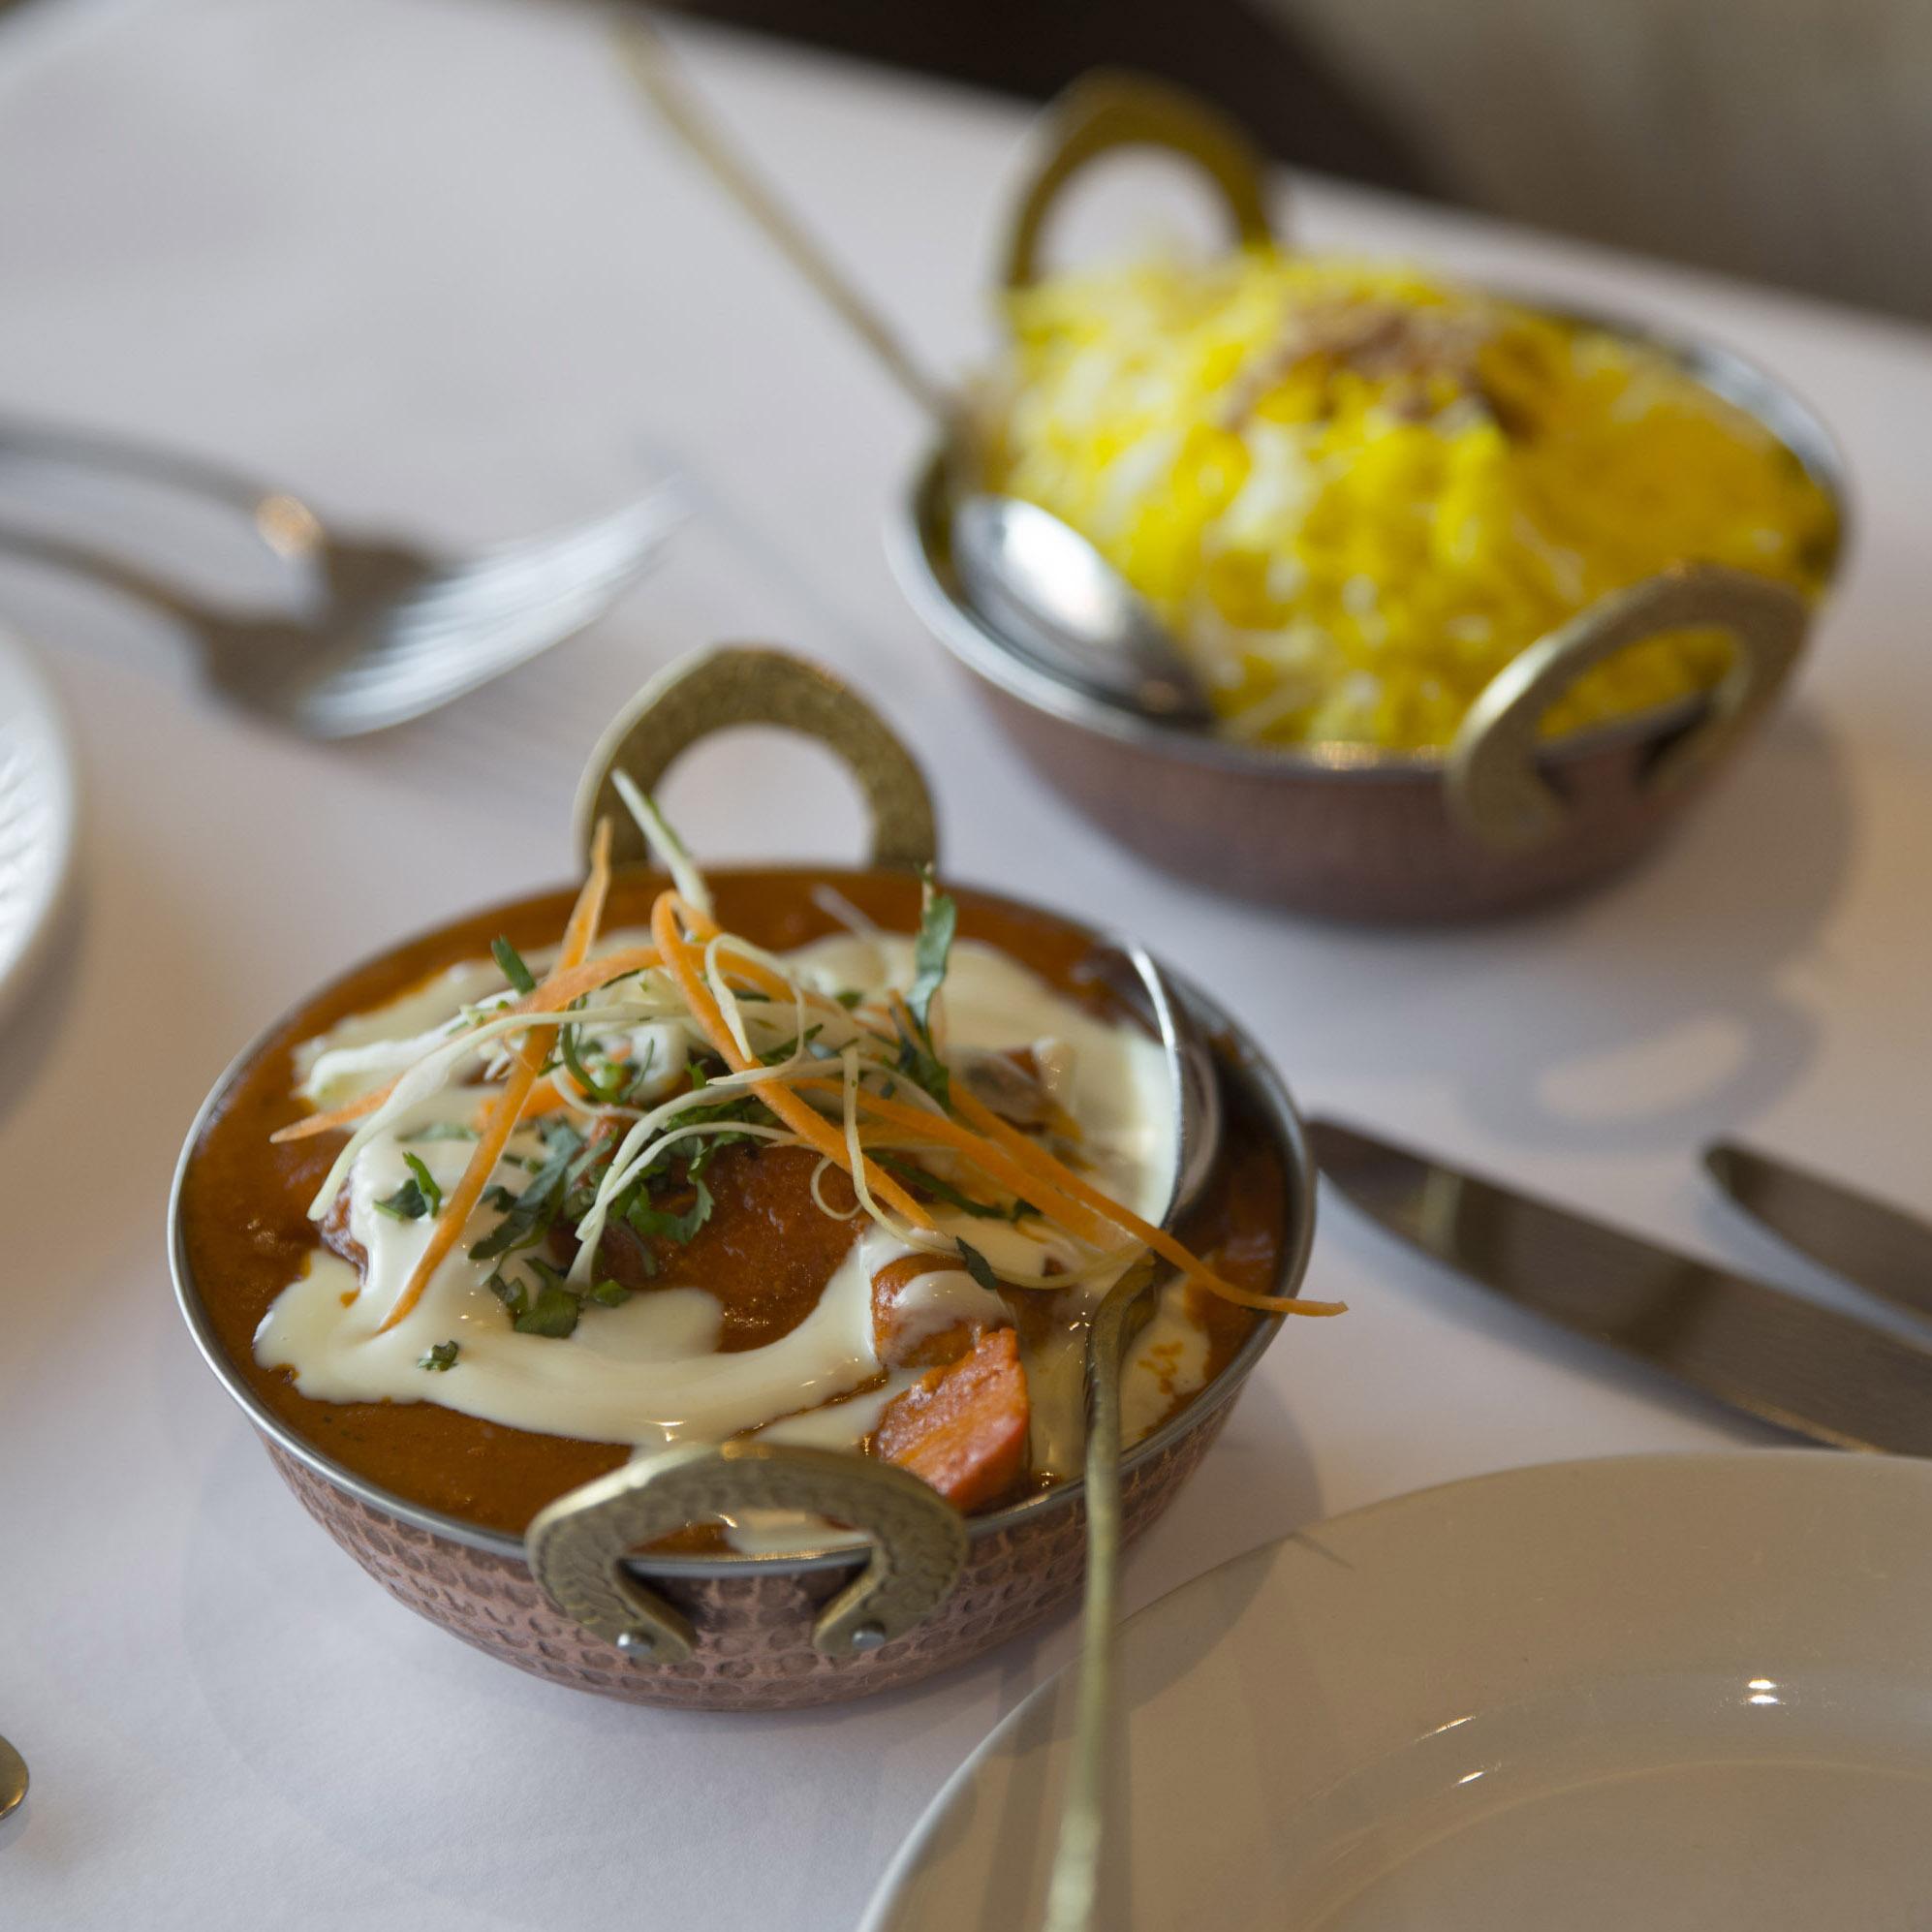 Balti Chicken Malai